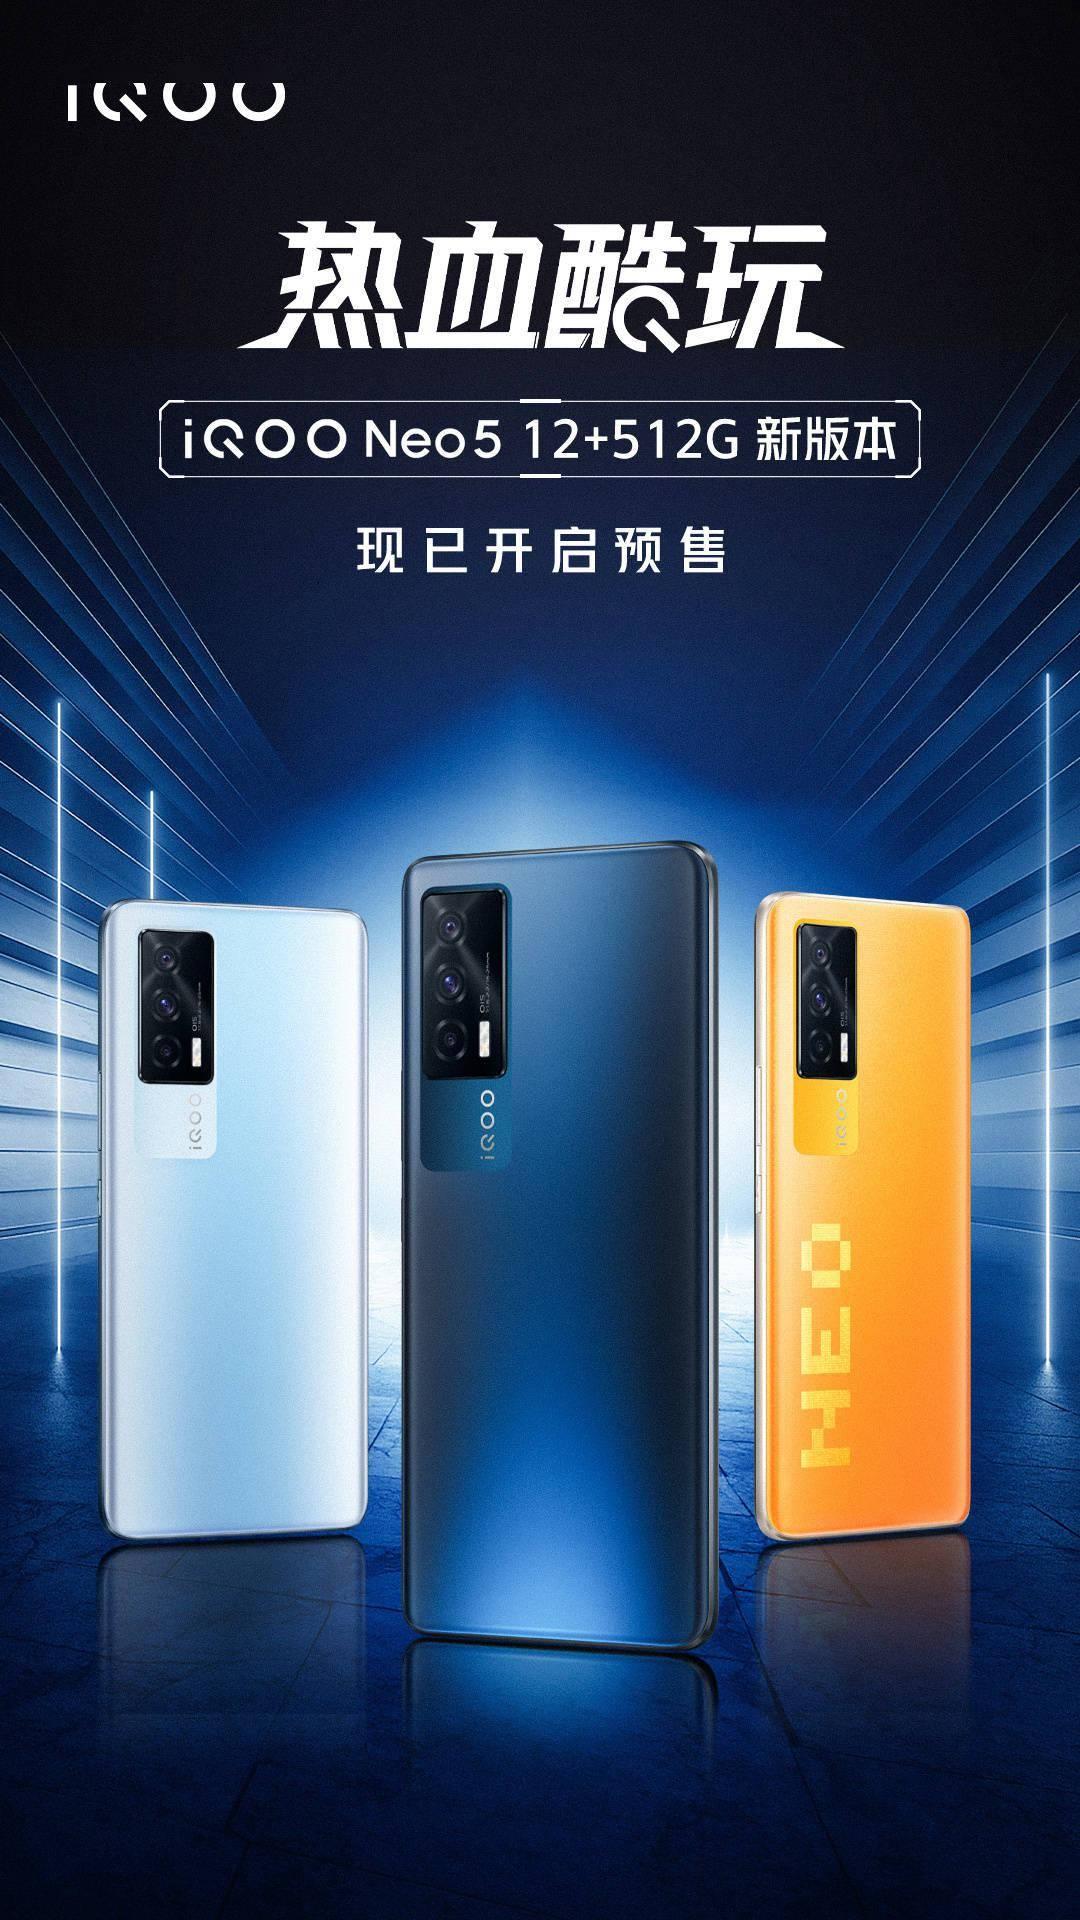 iQOO Neo5 12GB+512GB 版本发布,到手价 3099 元